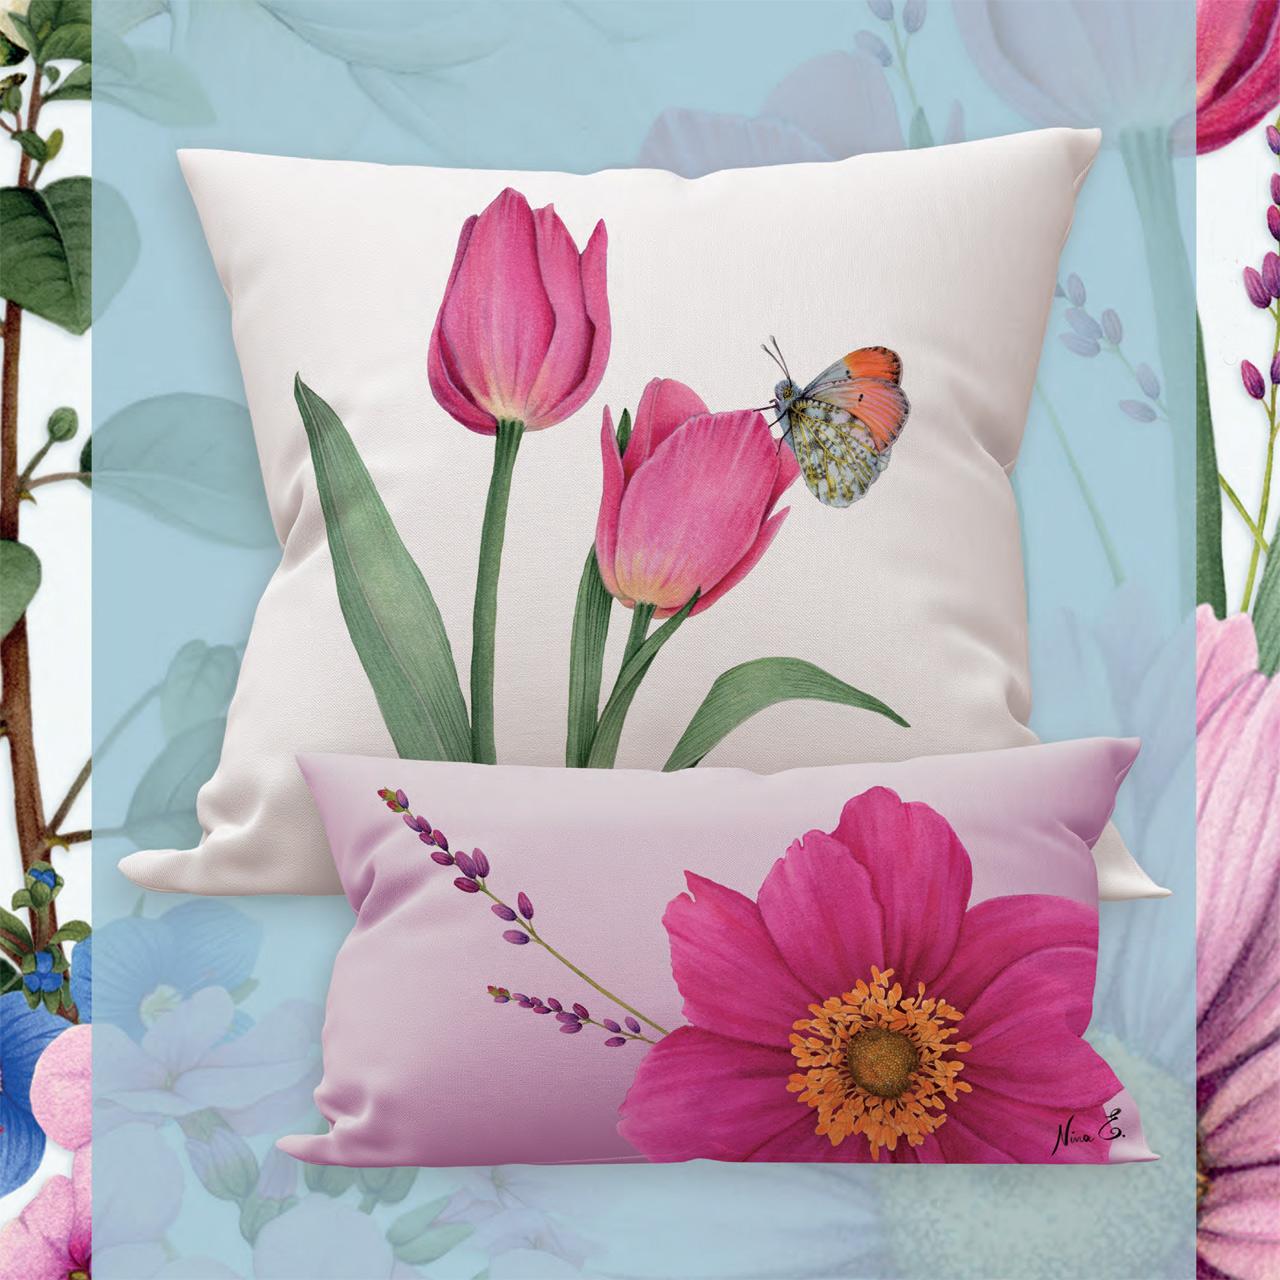 yu.me home collection pillows